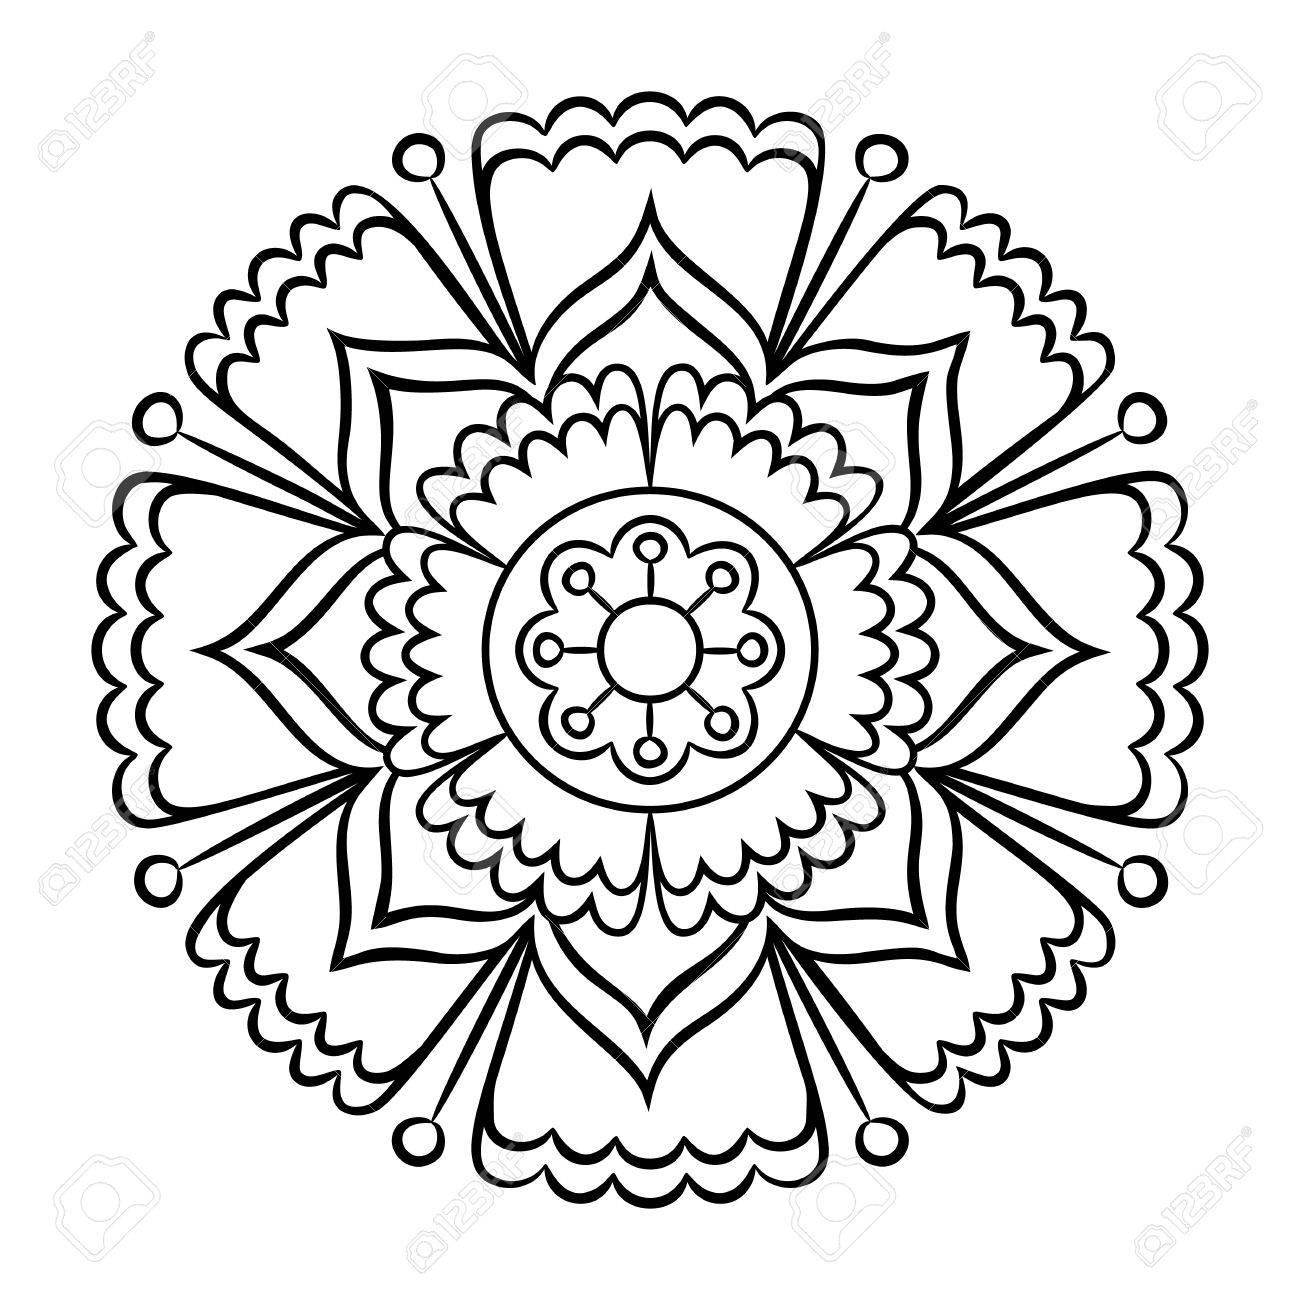 Colorear Mandala De Doodle. Esquema Elemento De Diseño Floral. El ...